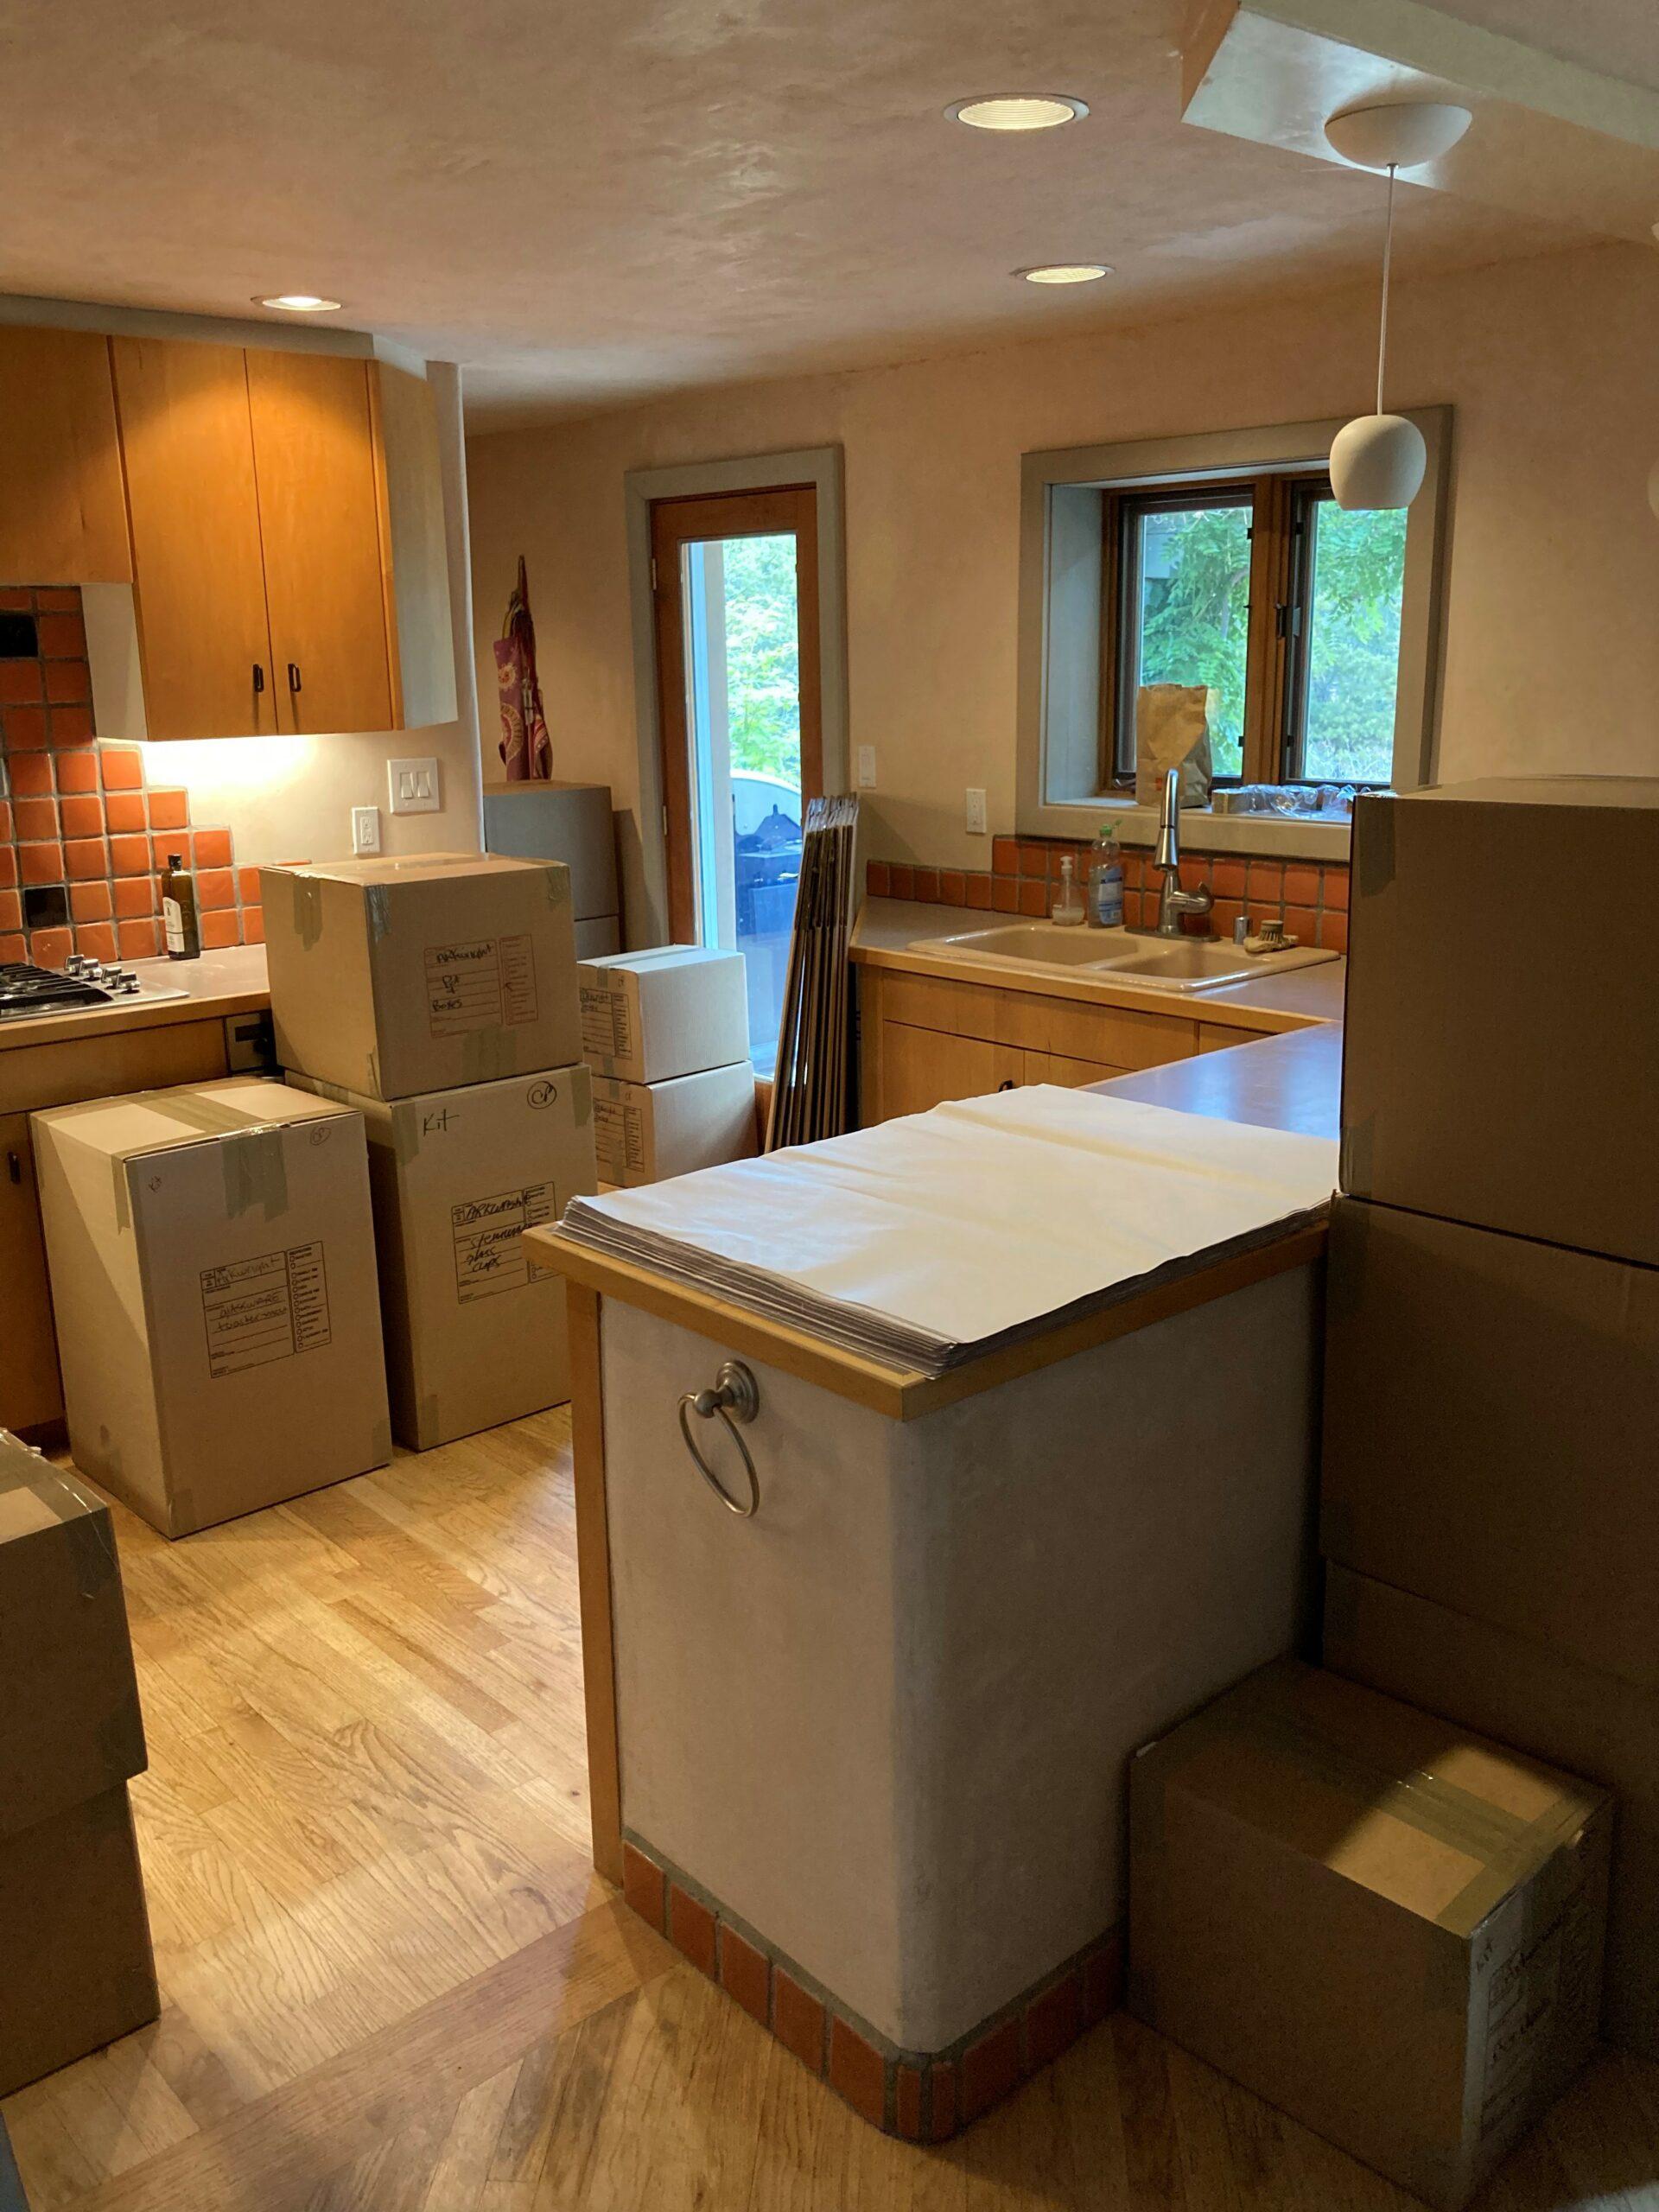 Beautiful Home and Beautiful Packing Job